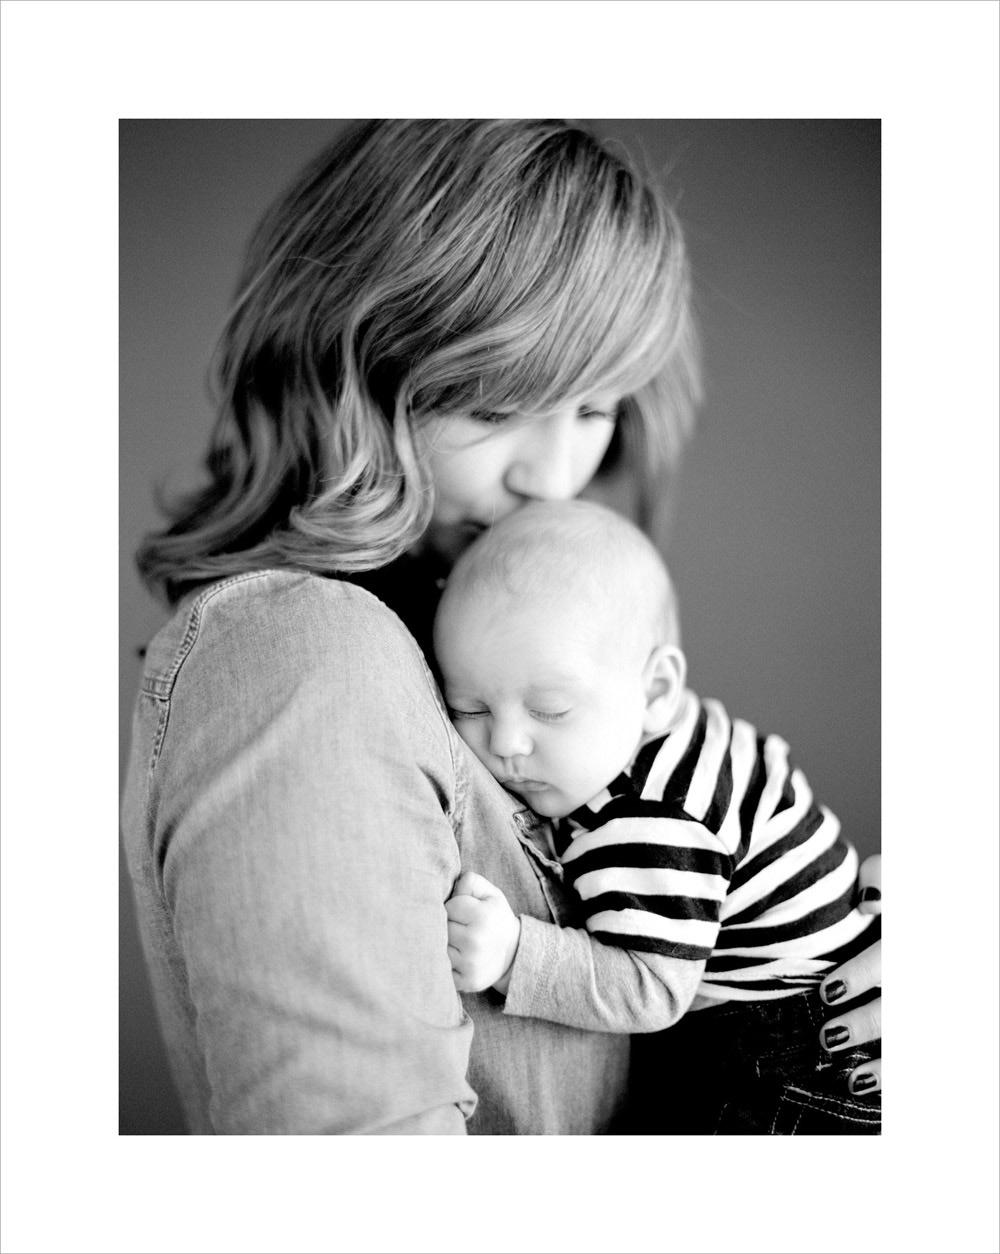 Eric-Yerke-Photography-2013-092.jpg